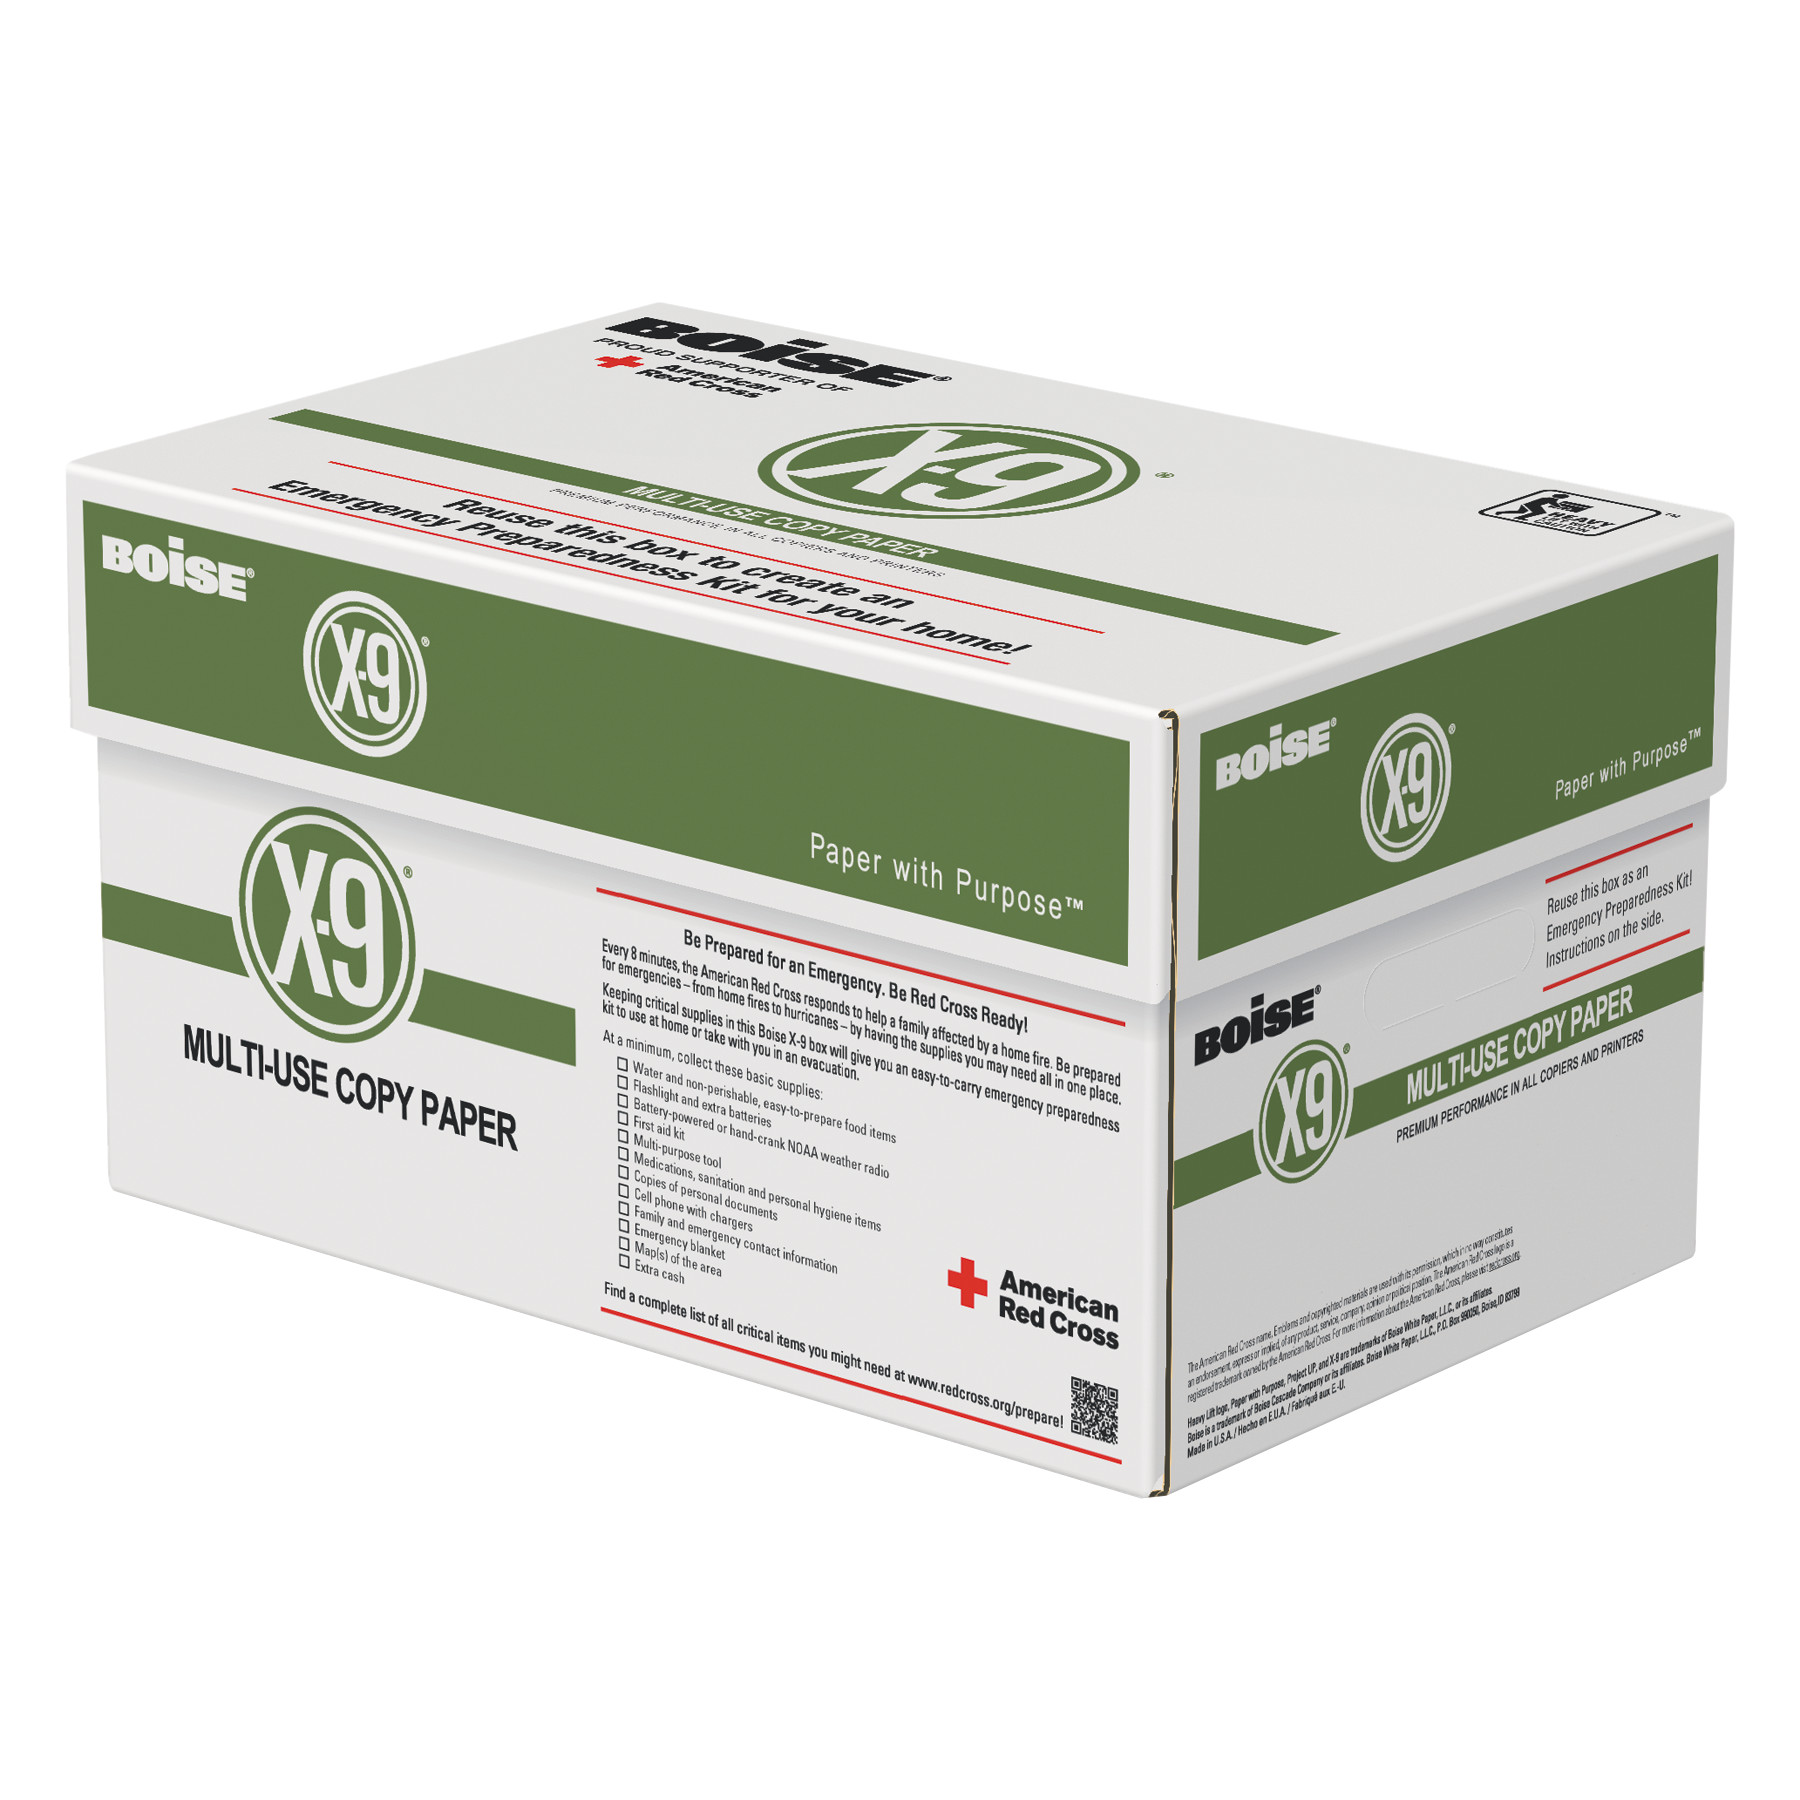 Boise X-9 Multi-Use Copy Paper, 92 Bright, 20lb, 8-1/2 x 11, 5000 Sheets